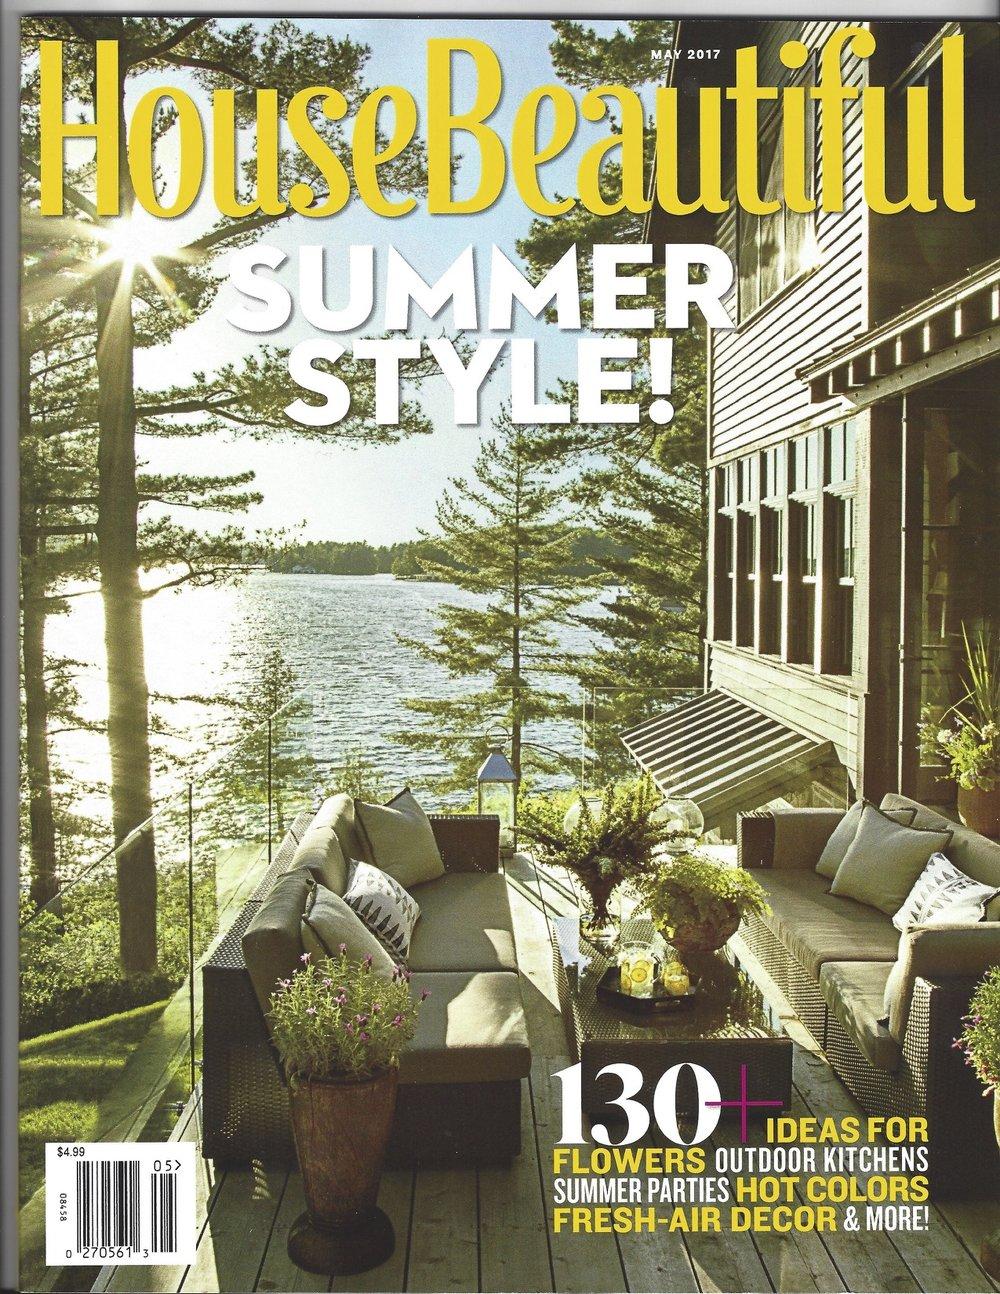 House Beautfiul Cover May 2017.jpg